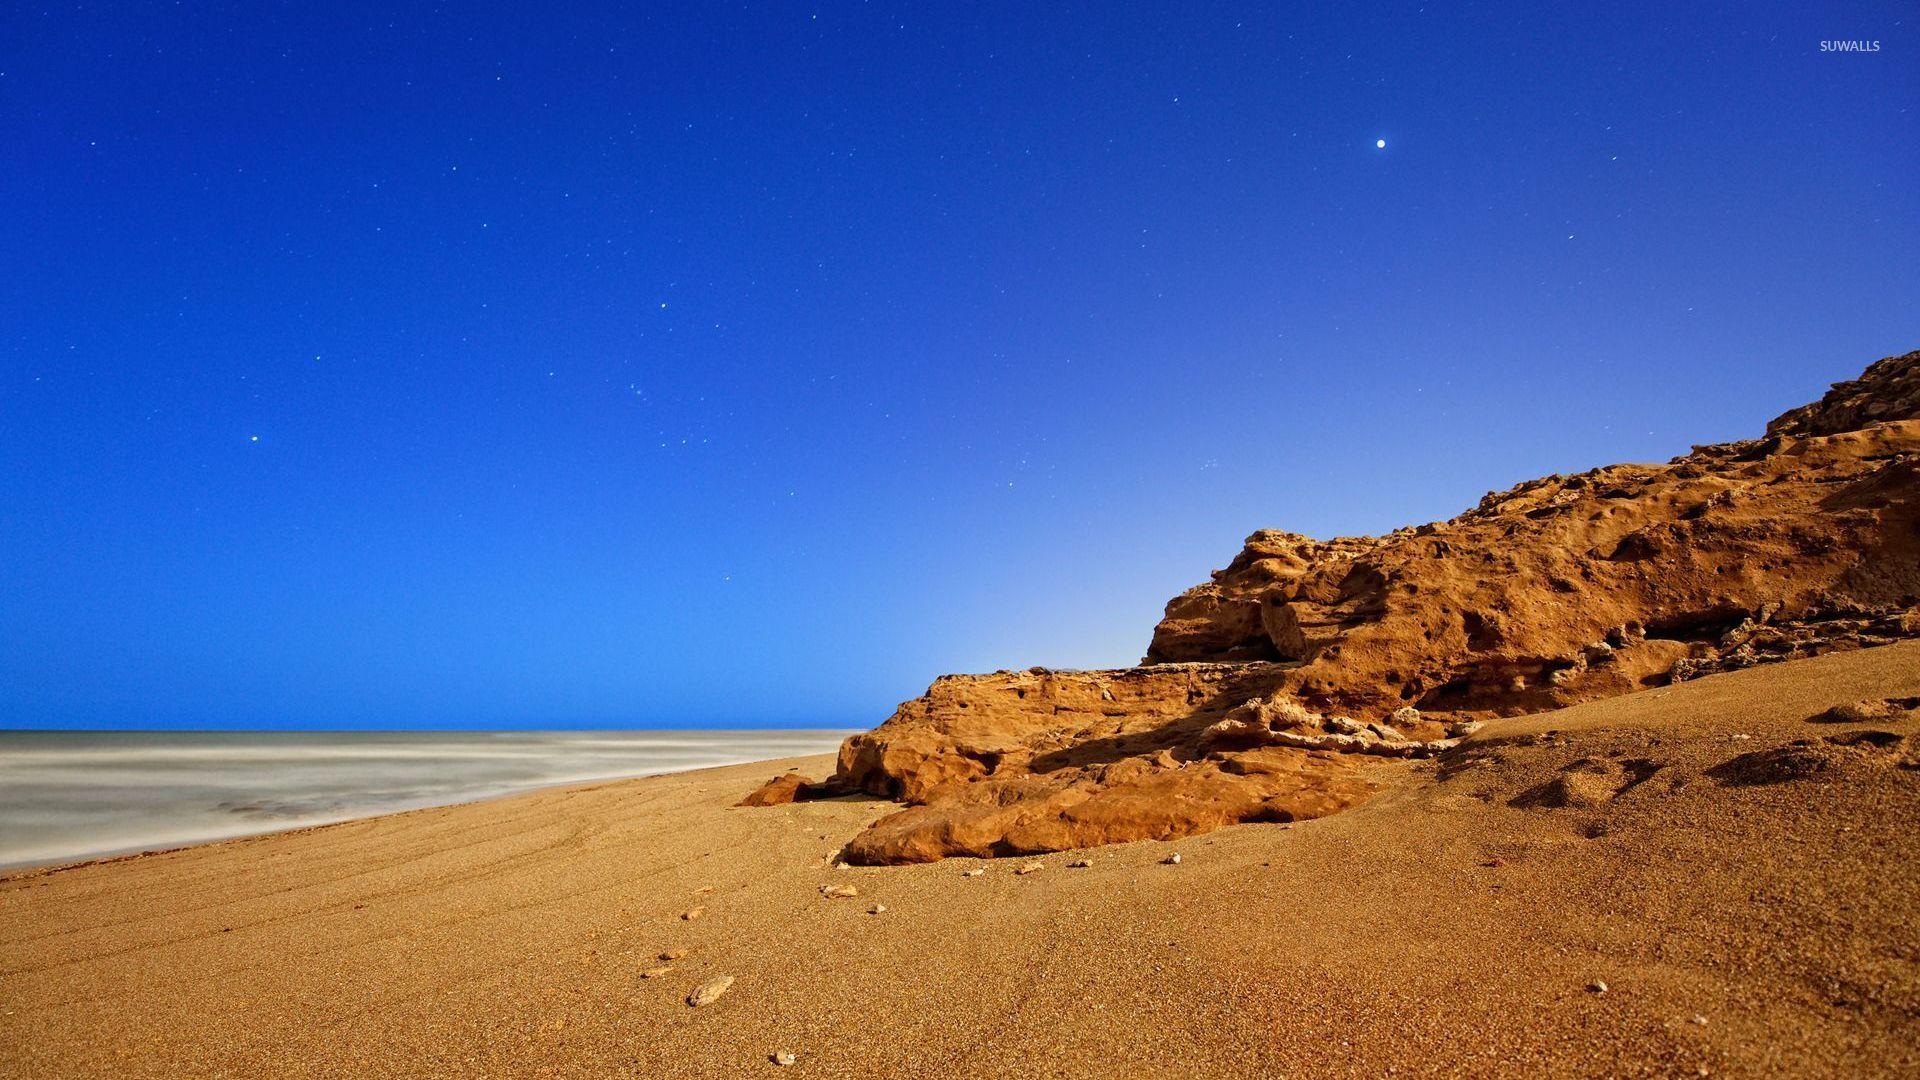 Sandy Beach Wallpaper: Rusty Rock On Sandy Beach Wallpaper